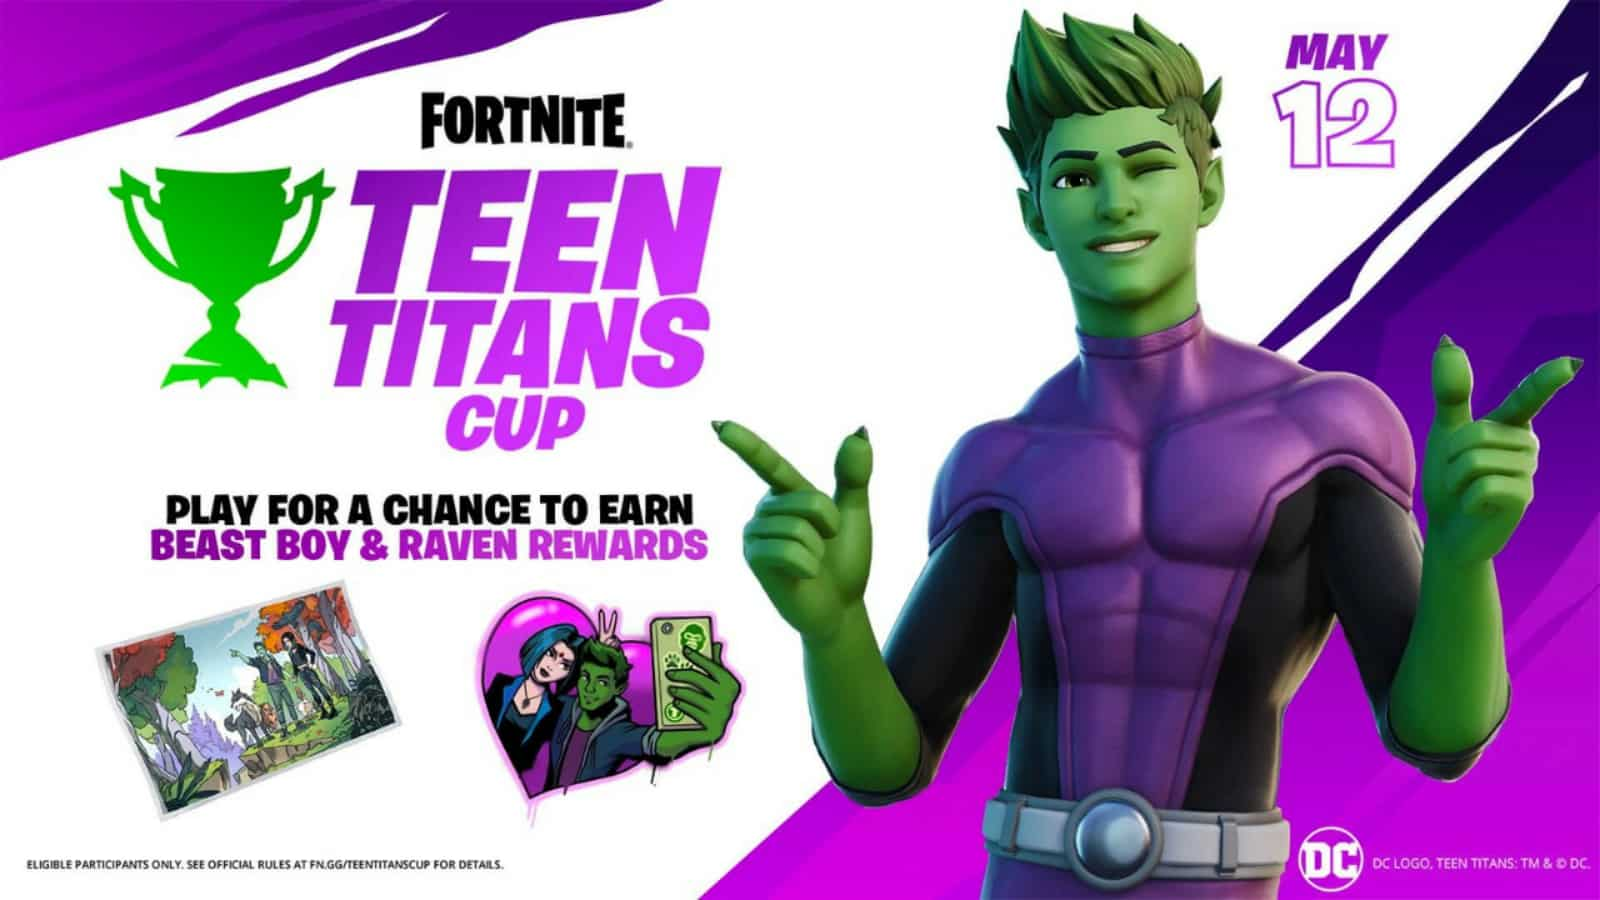 DC Beast Boy Fortnite Skin and New Teen Titans Cup: